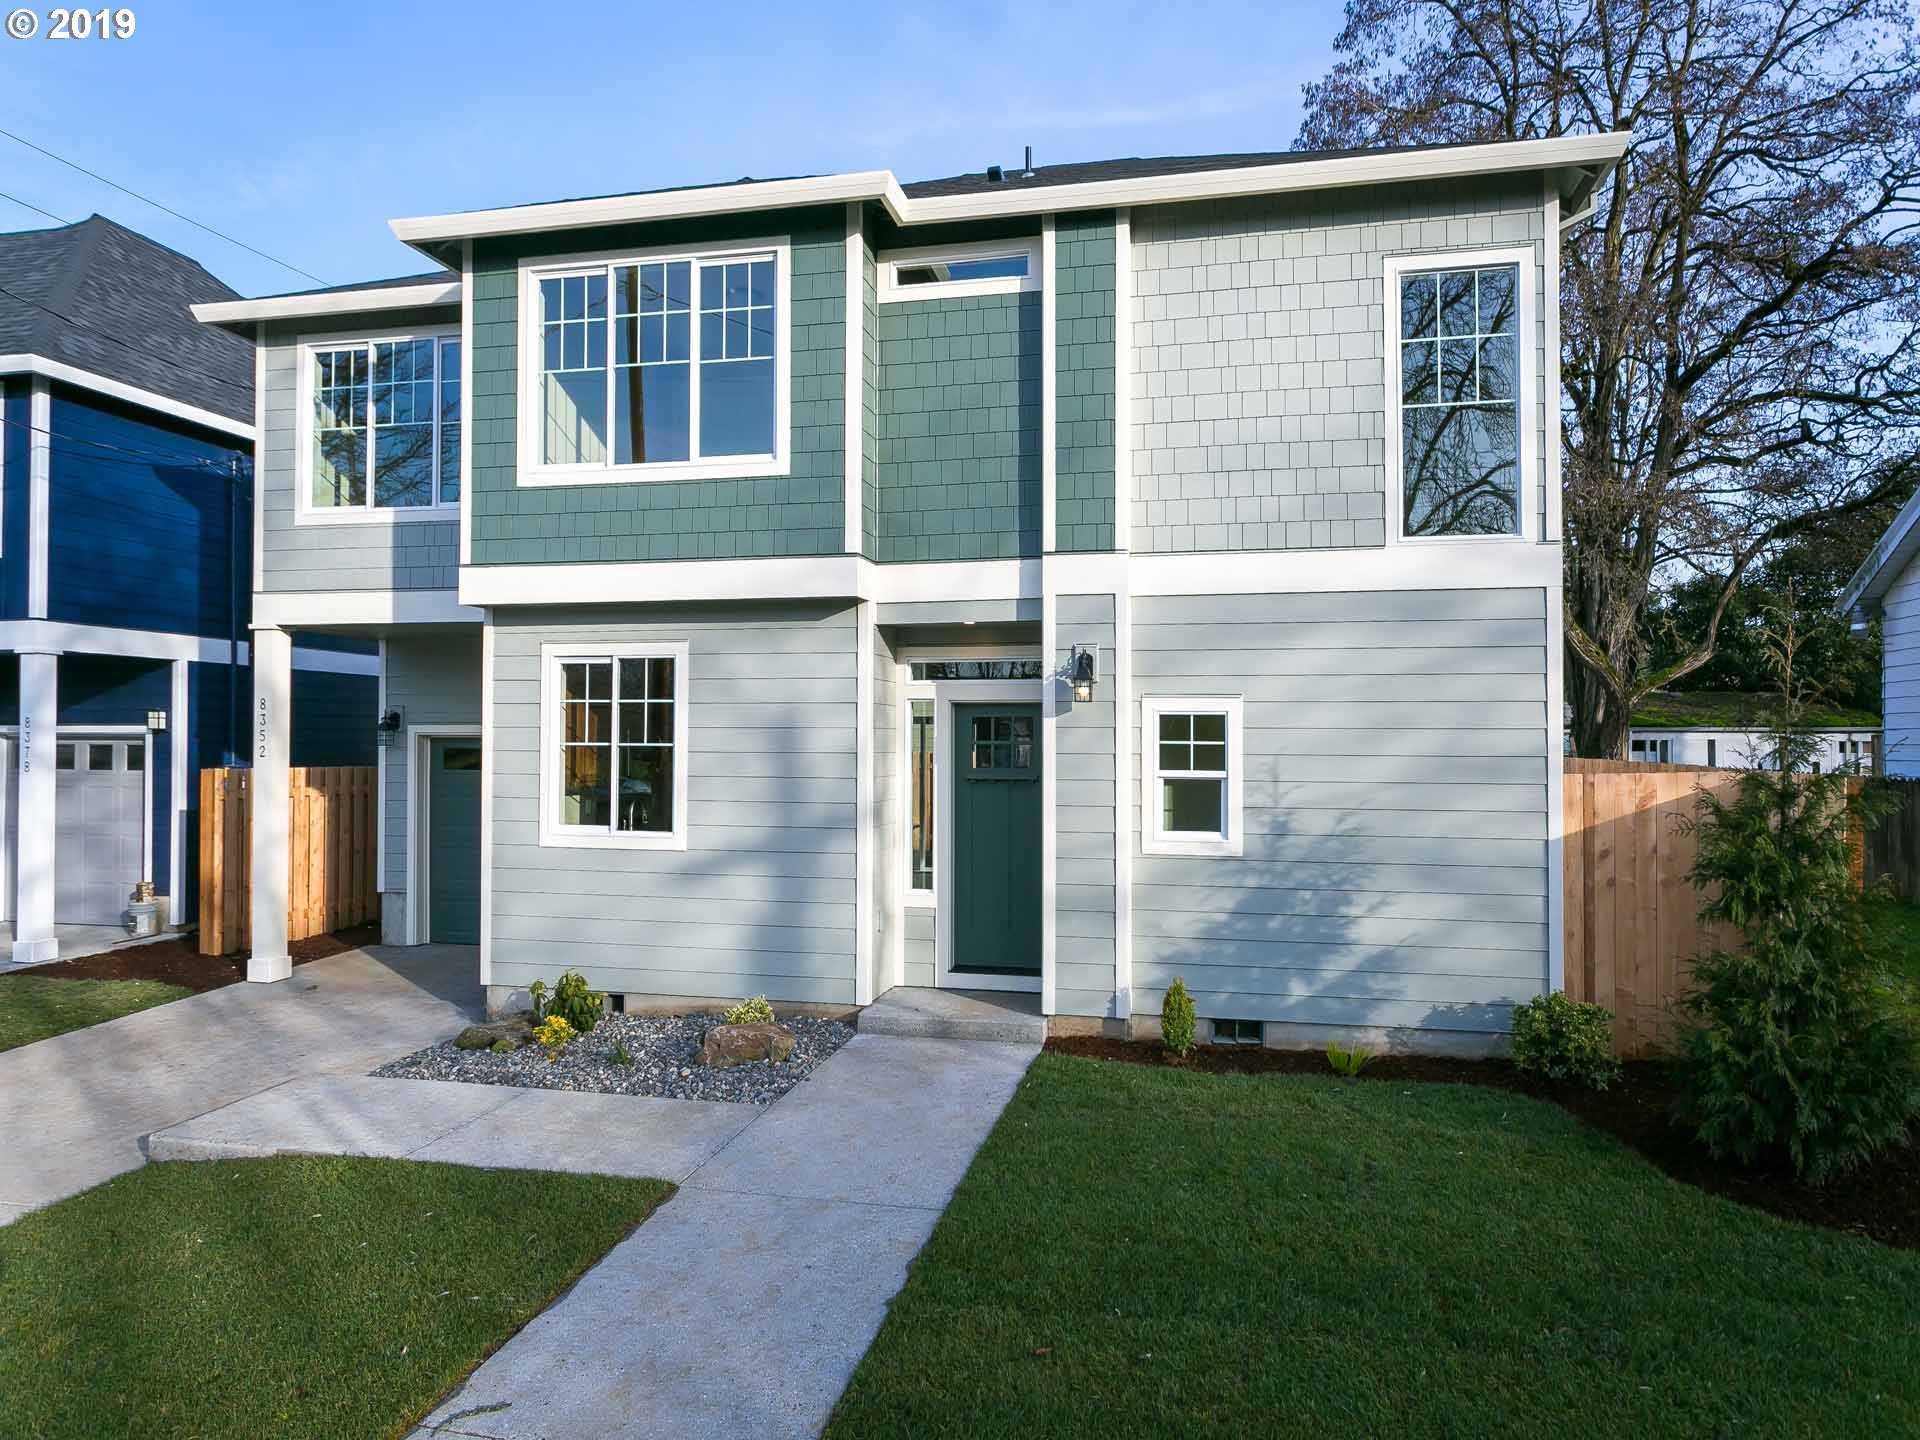 $499,999 - 4Br/3Ba -  for Sale in Kenton, Portland